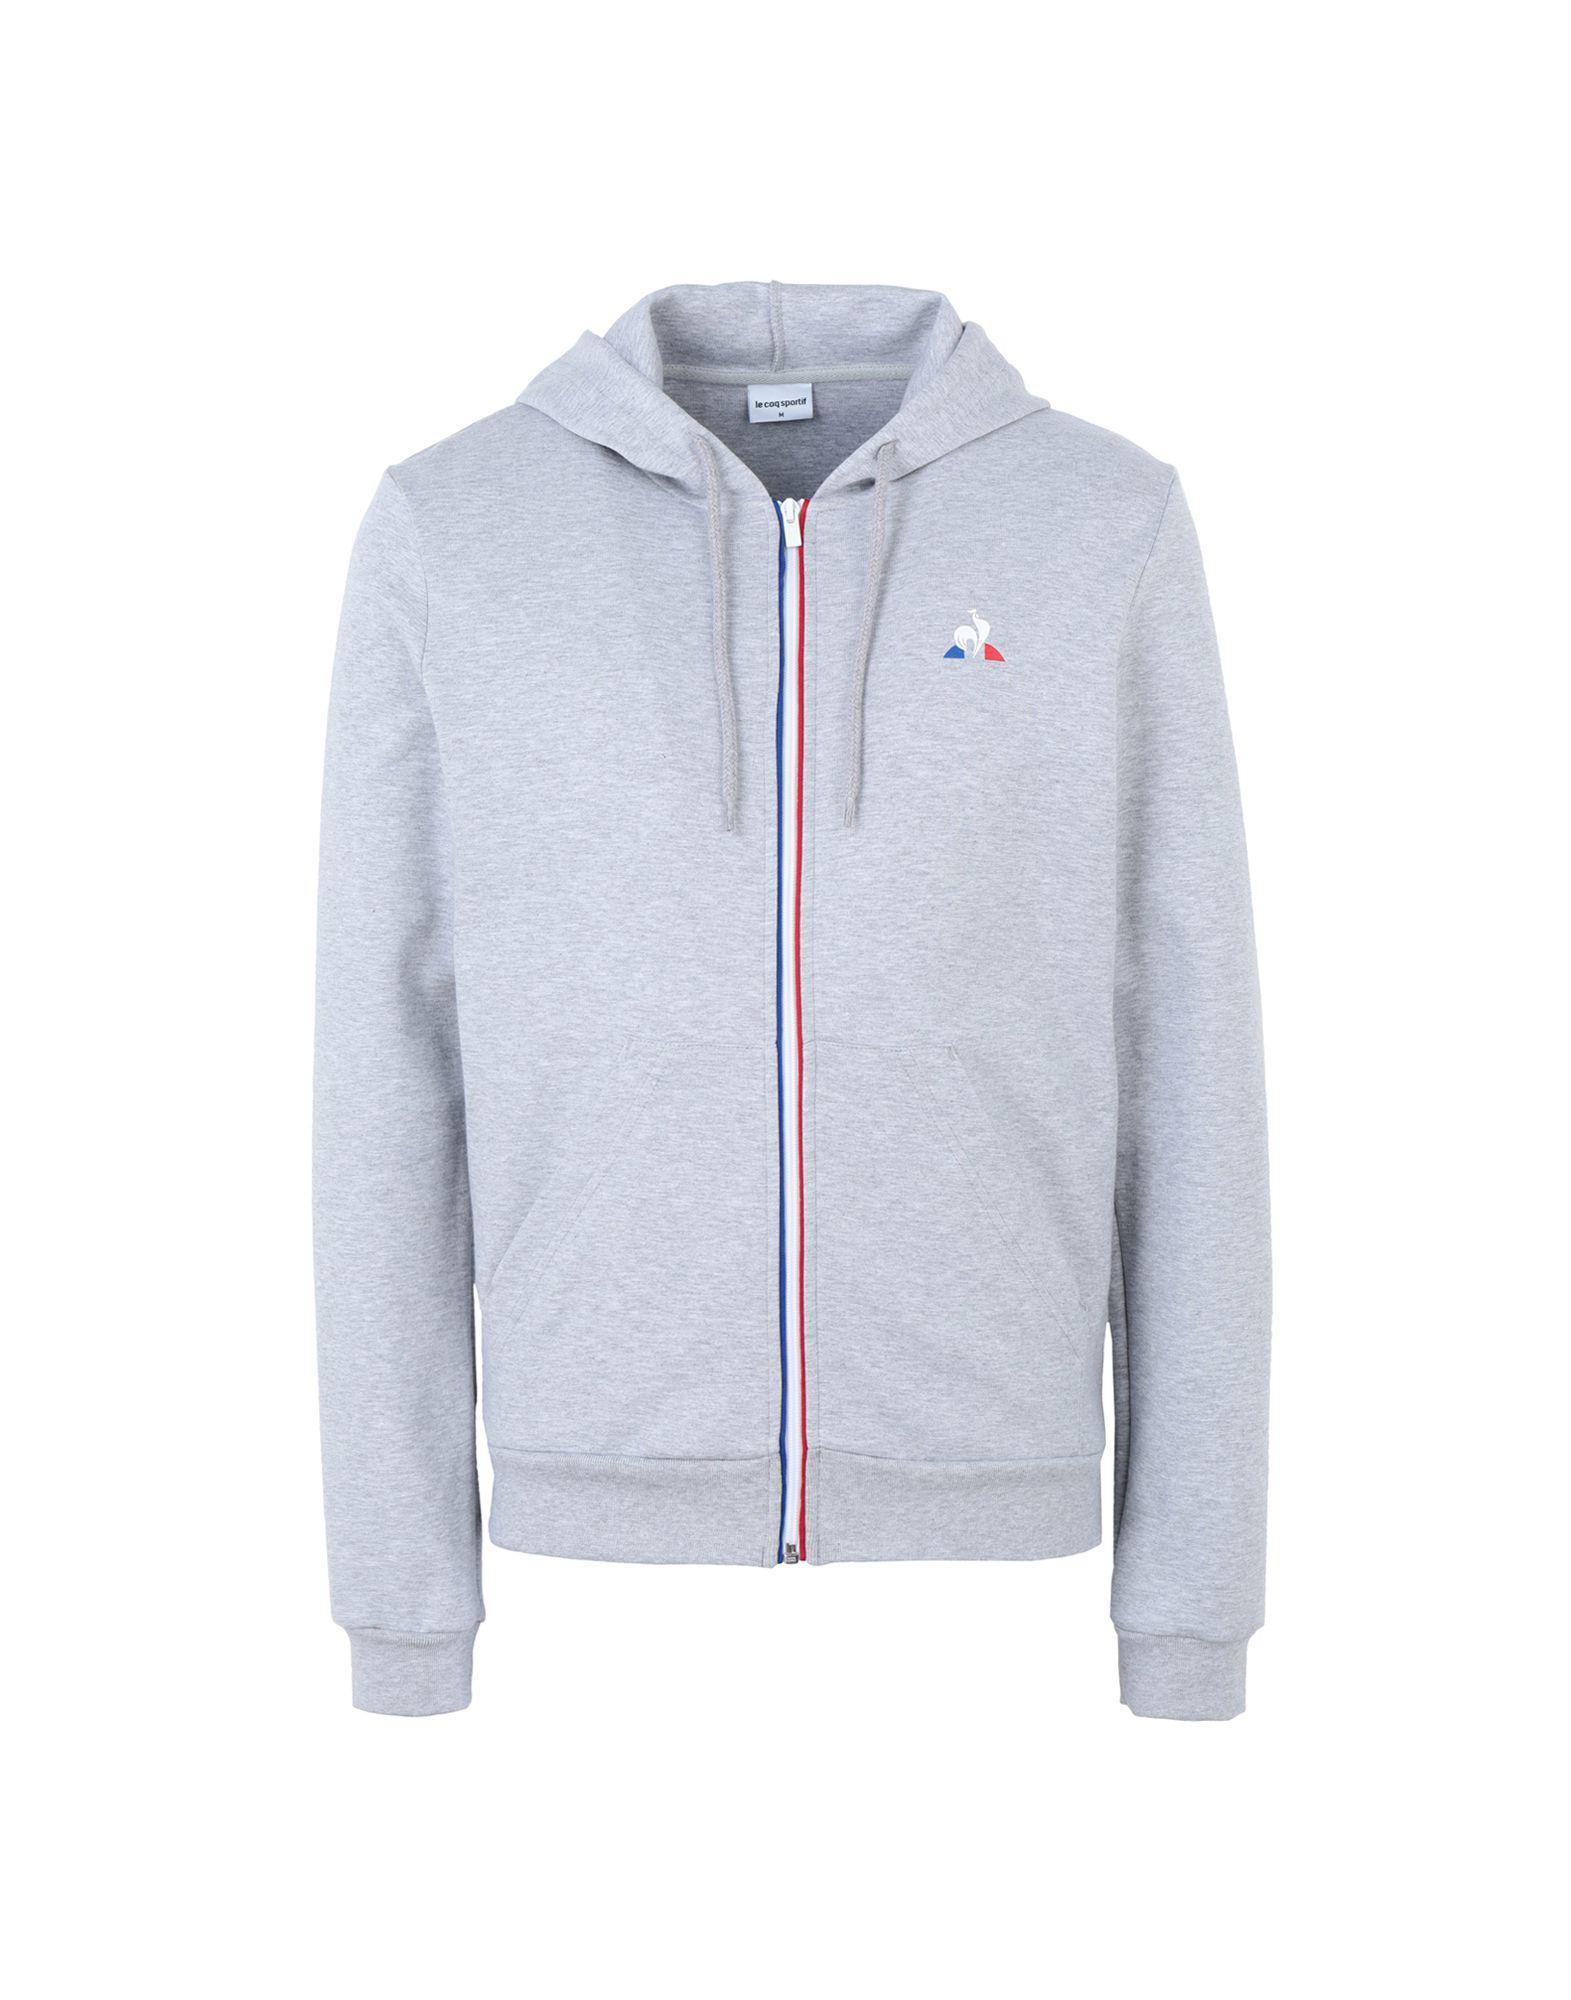 35e2be2979f1 Le Coq Sportif - Gray Sweatshirt for Men - Lyst. View fullscreen